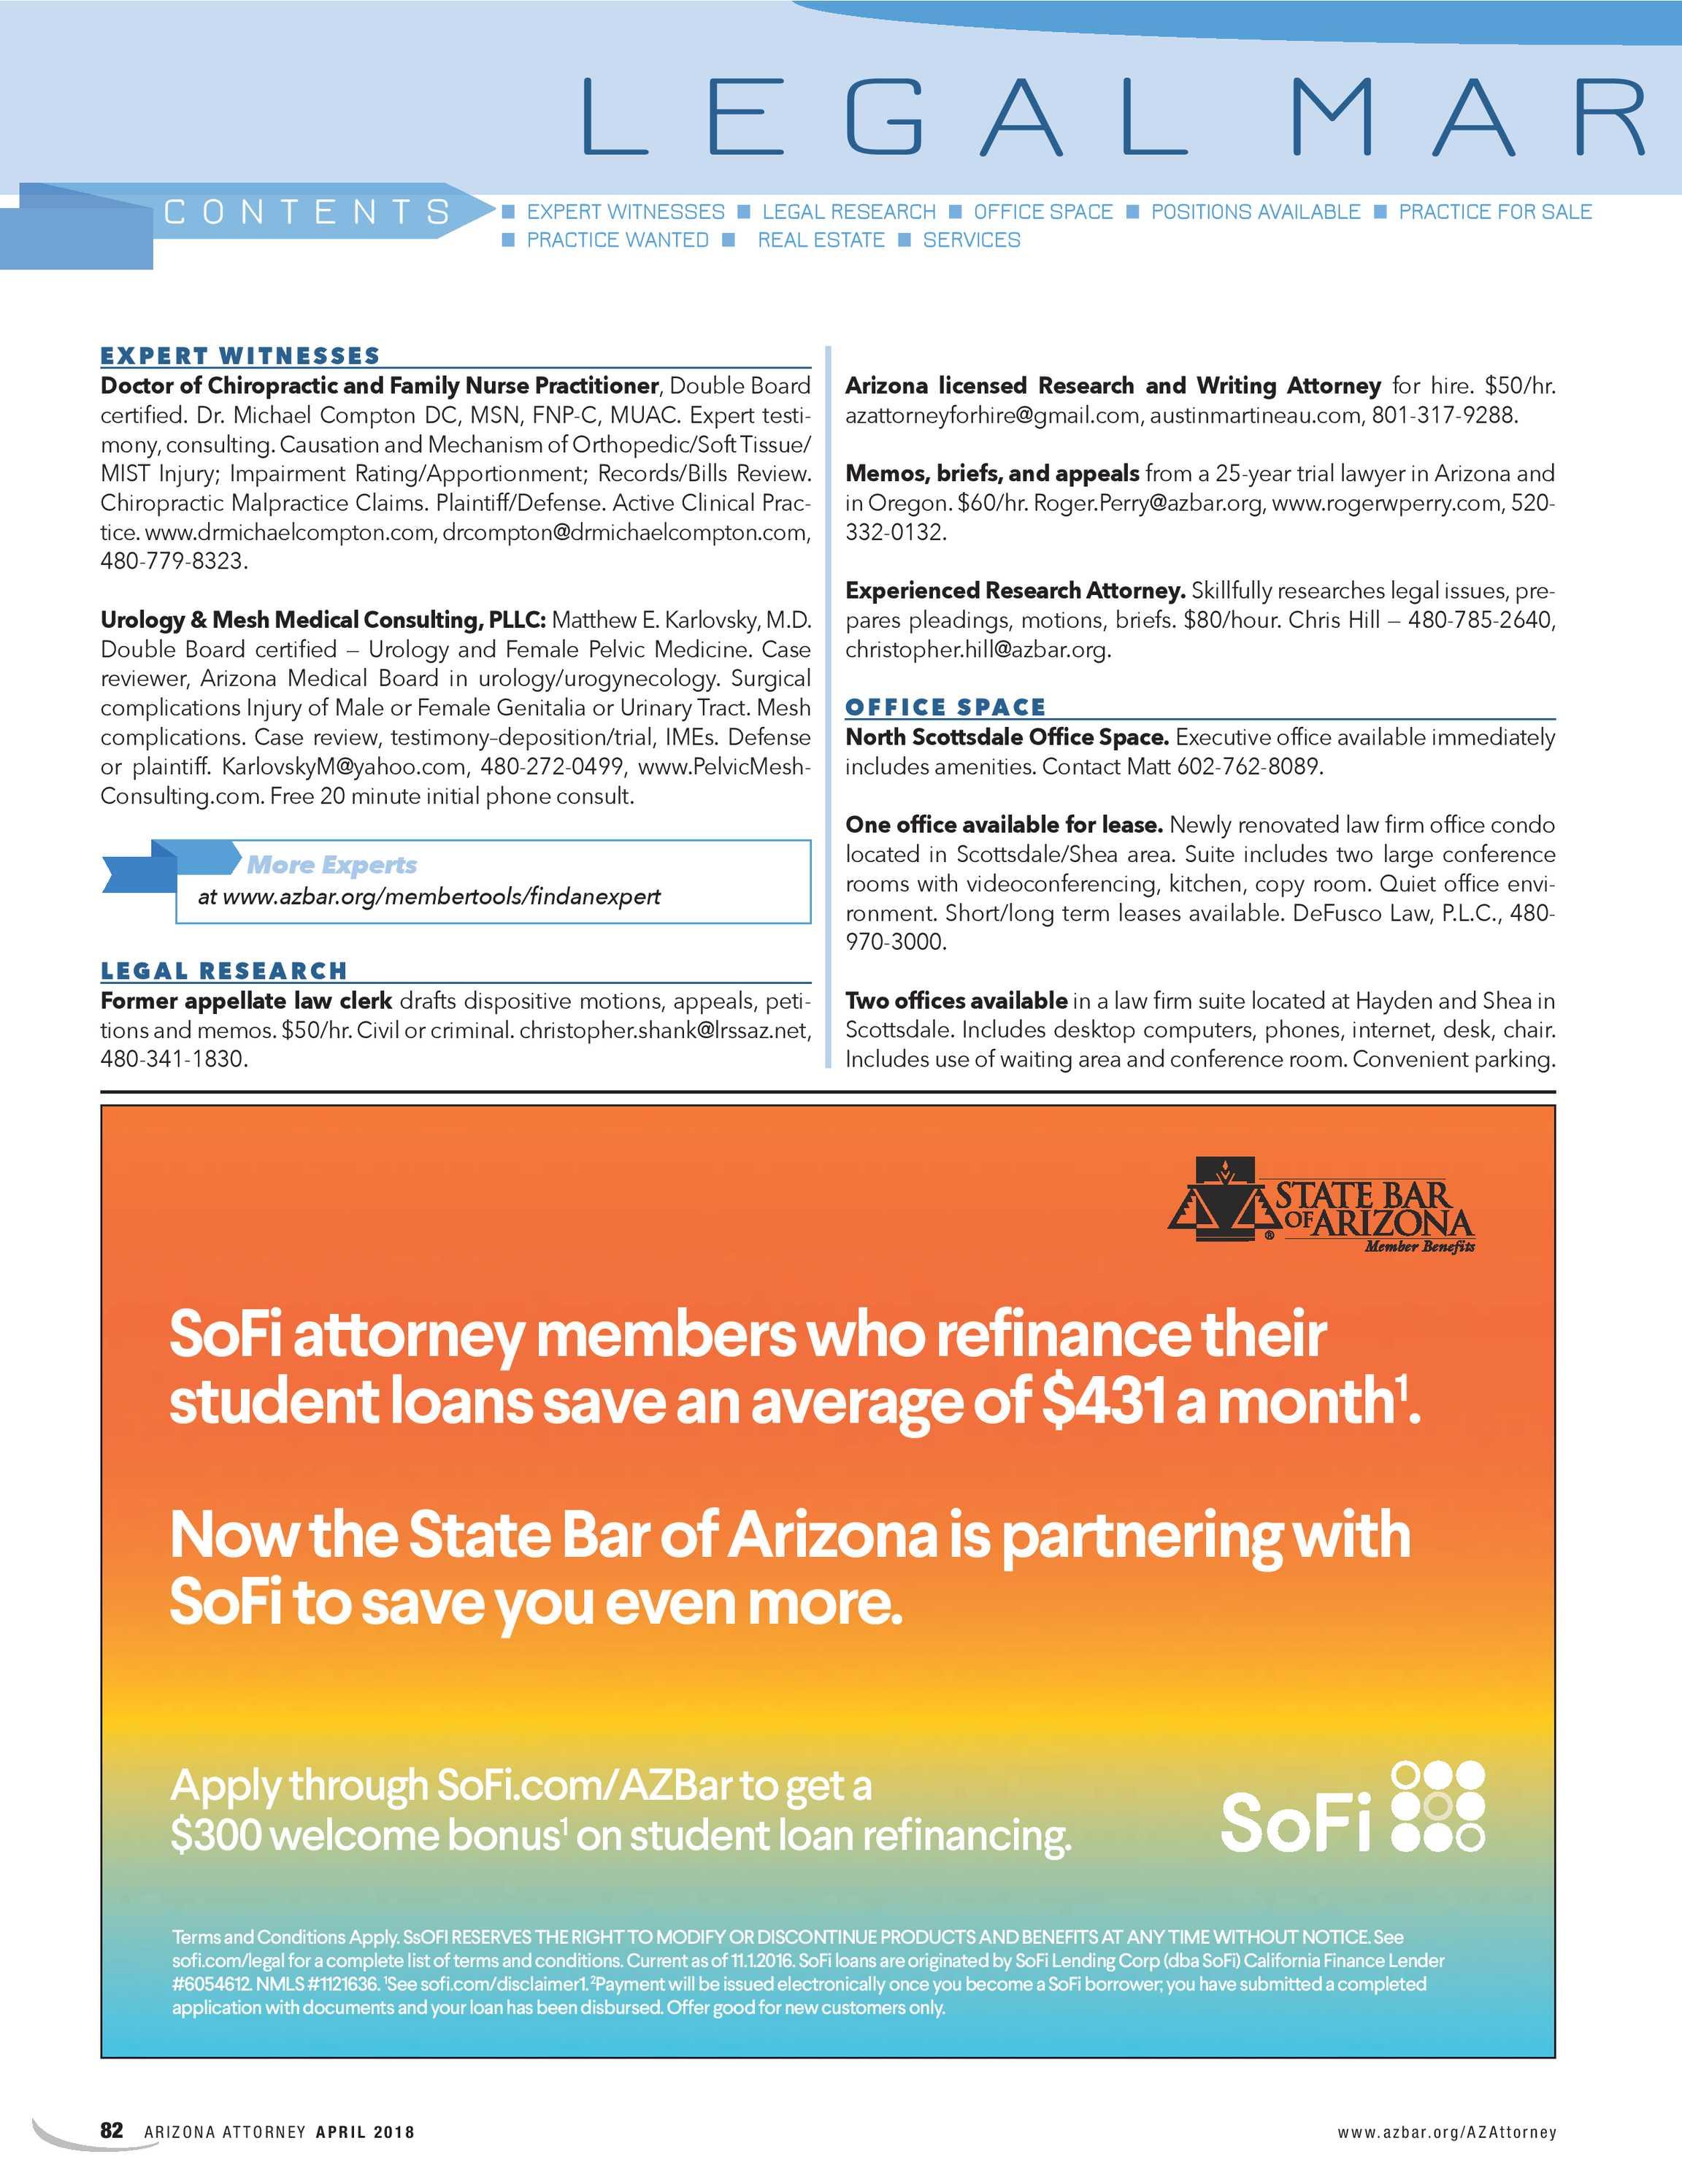 Arizona Attorney April 2018 Page 82